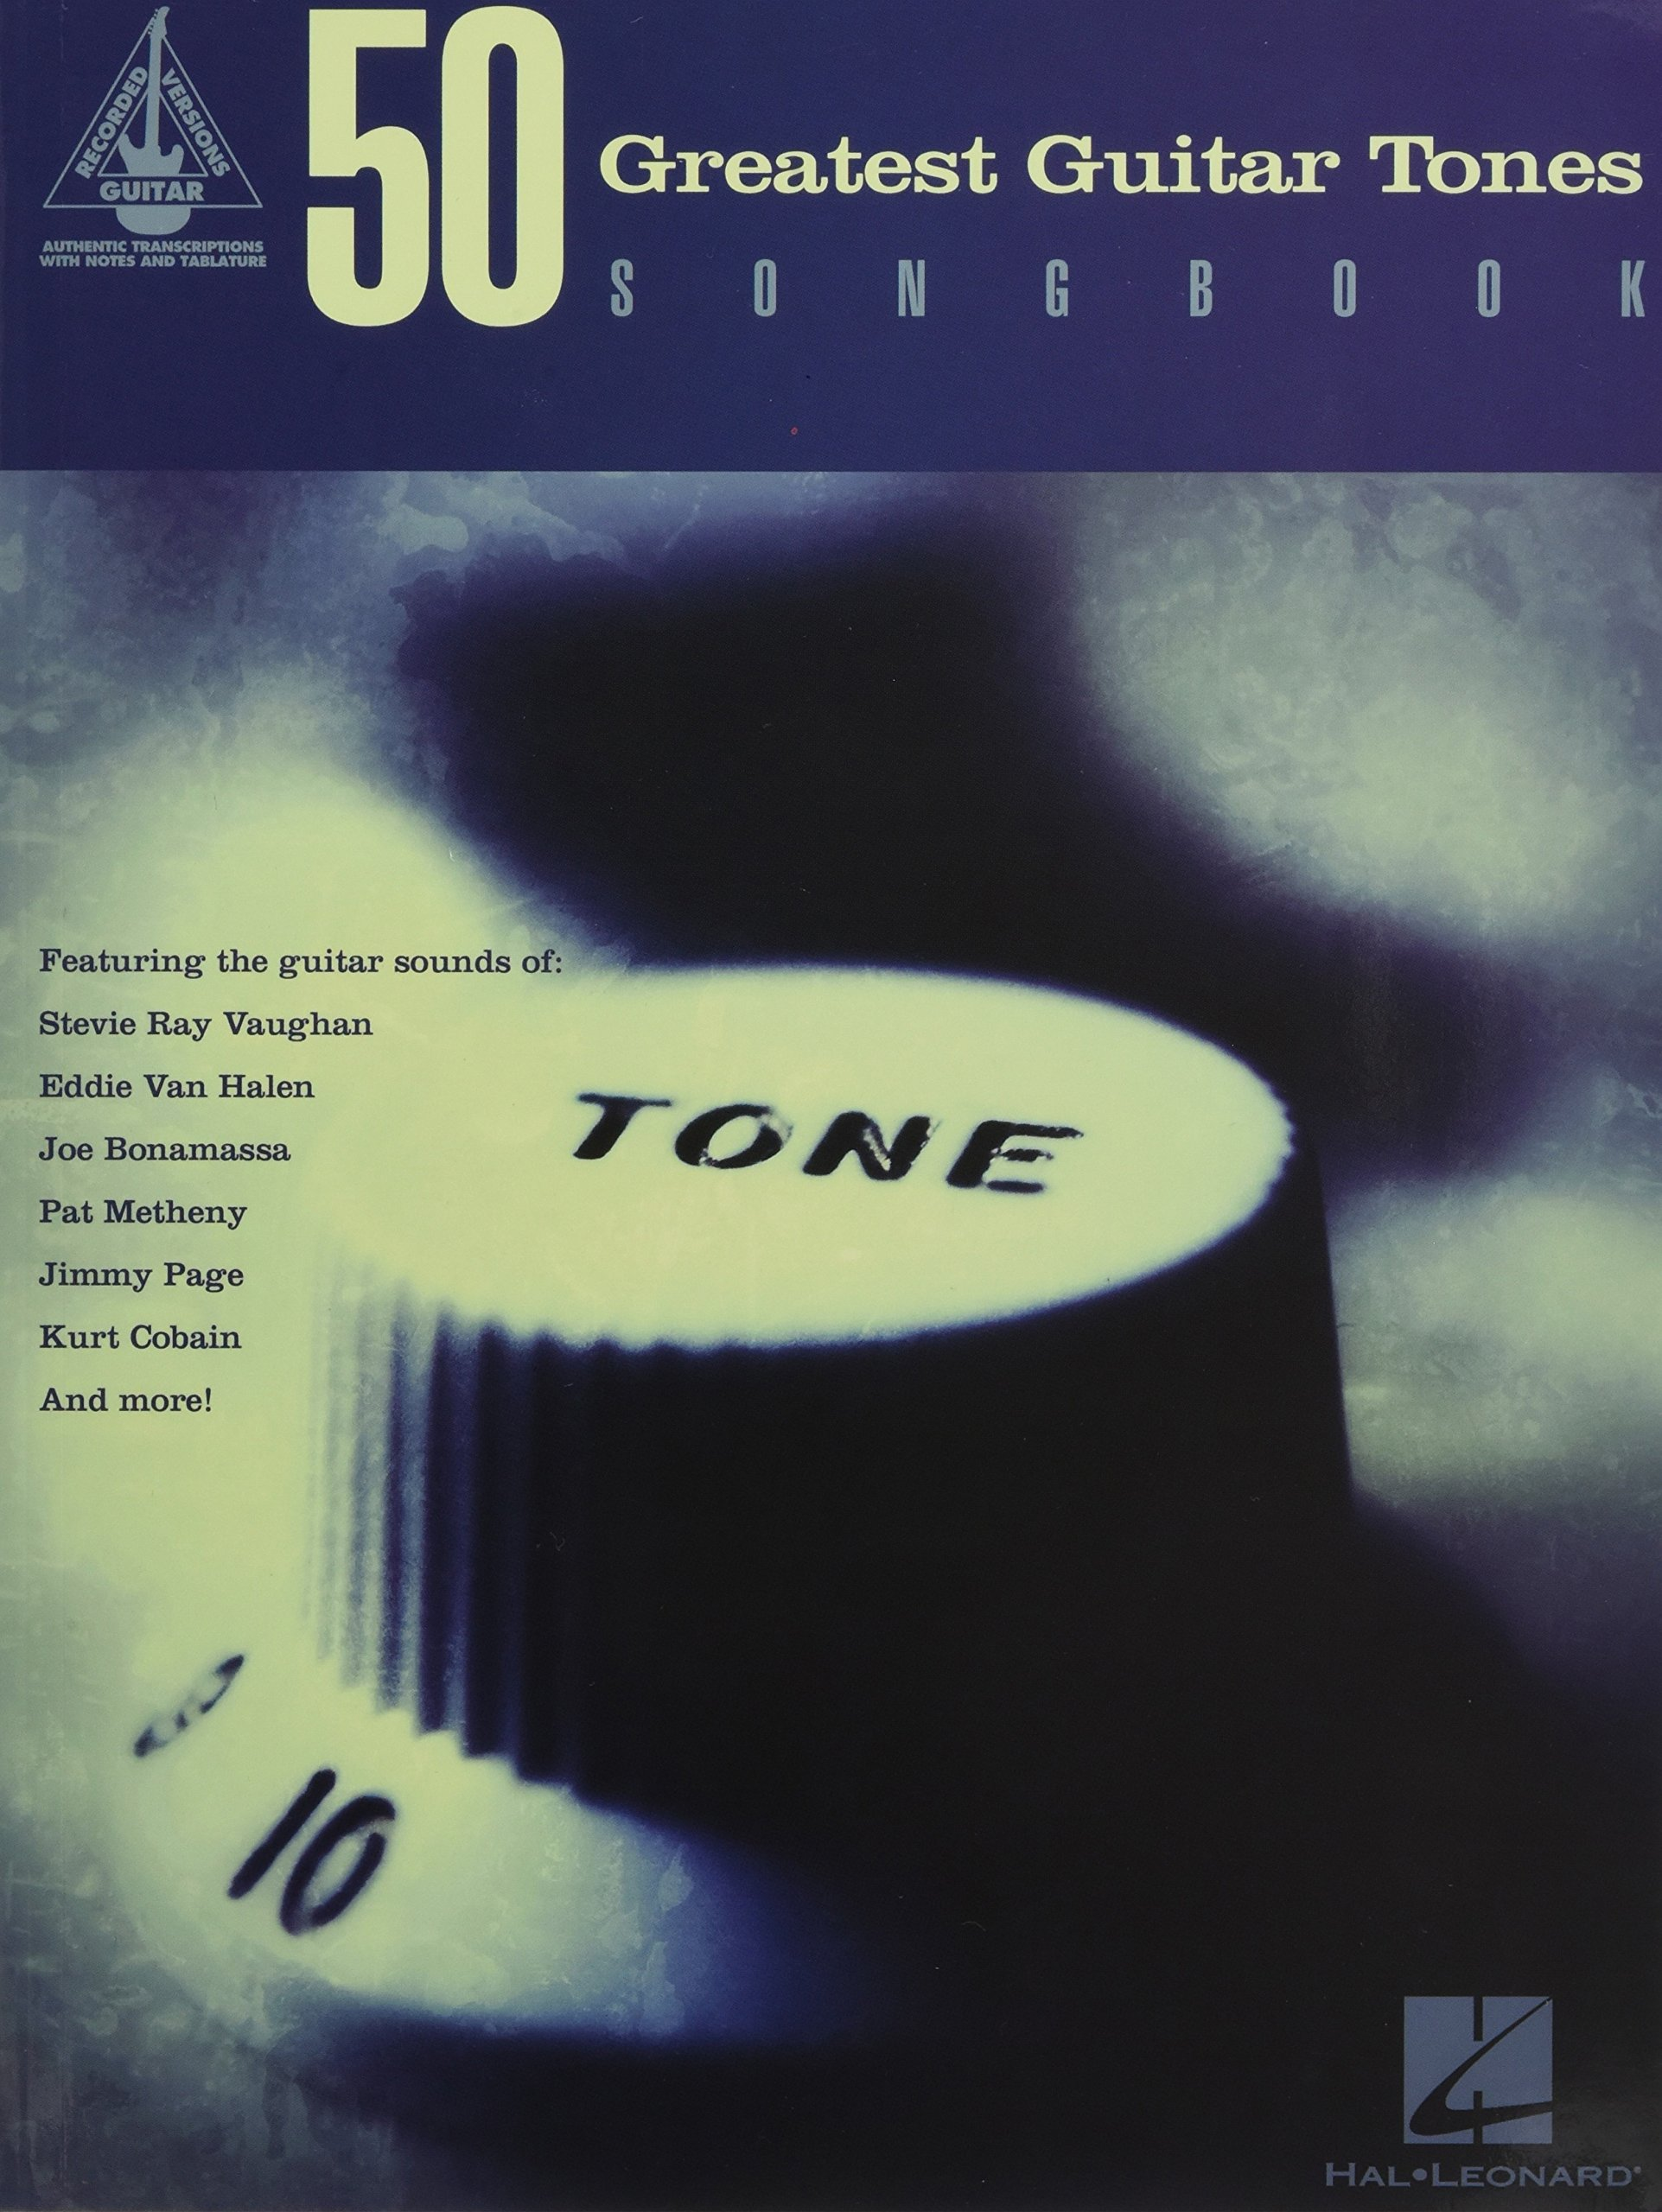 50 Greatest Guitar Tones Songbook (Guitar Recorded Versions) ebook